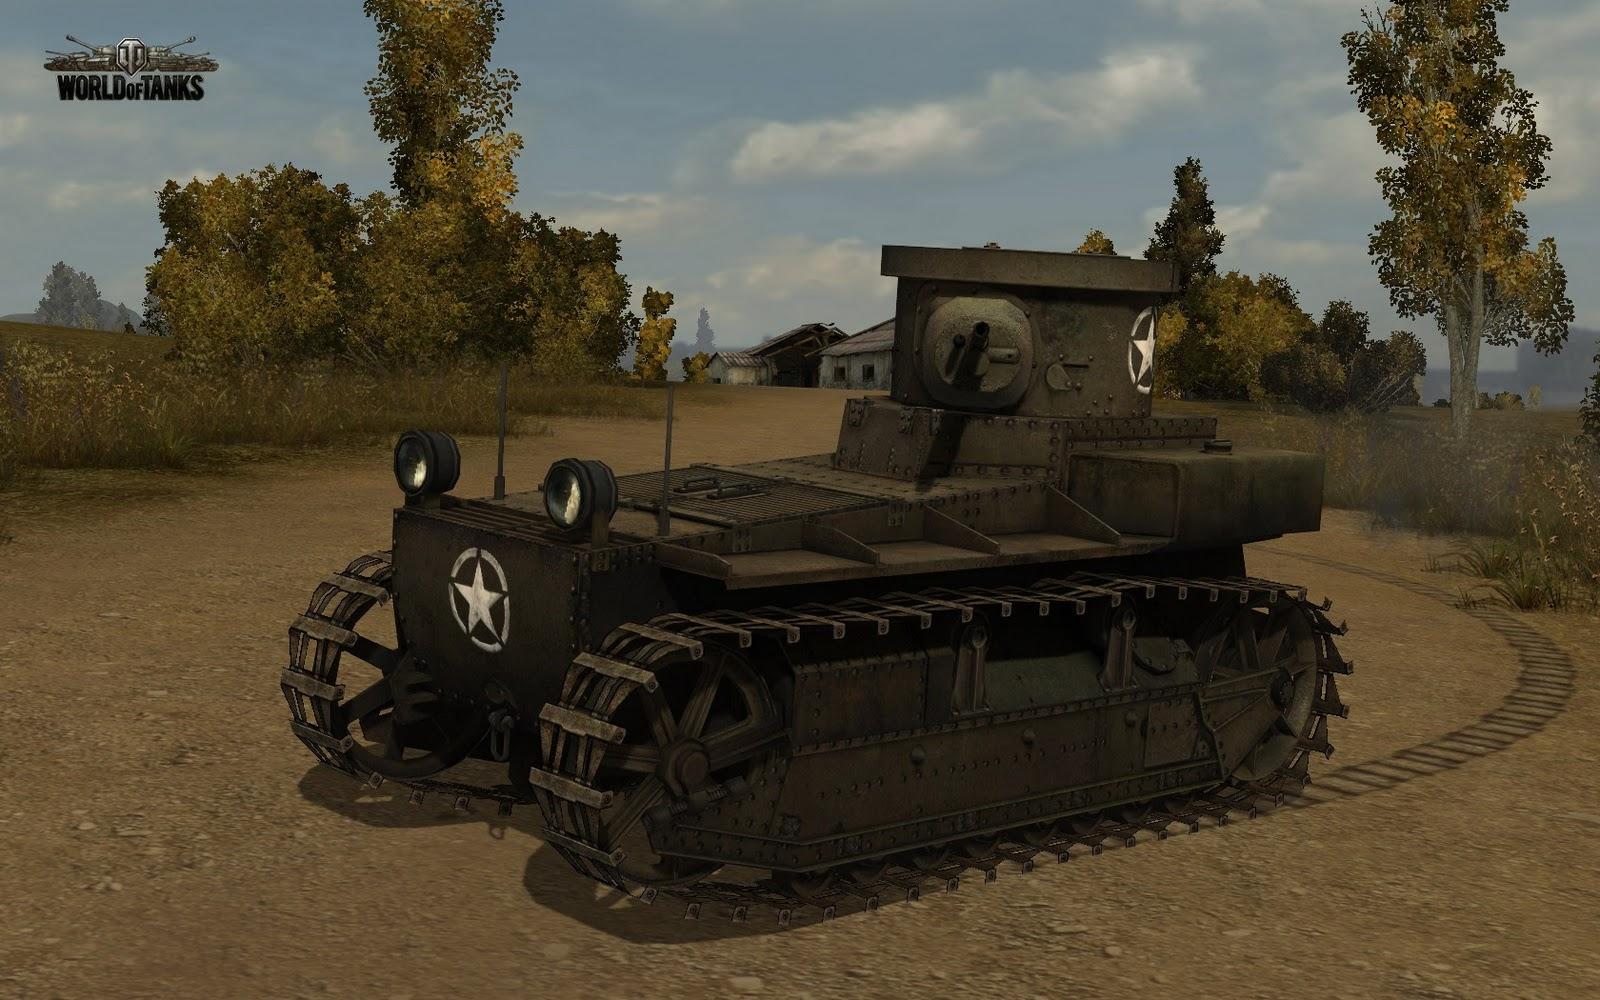 World of tanks характеристики легких танков